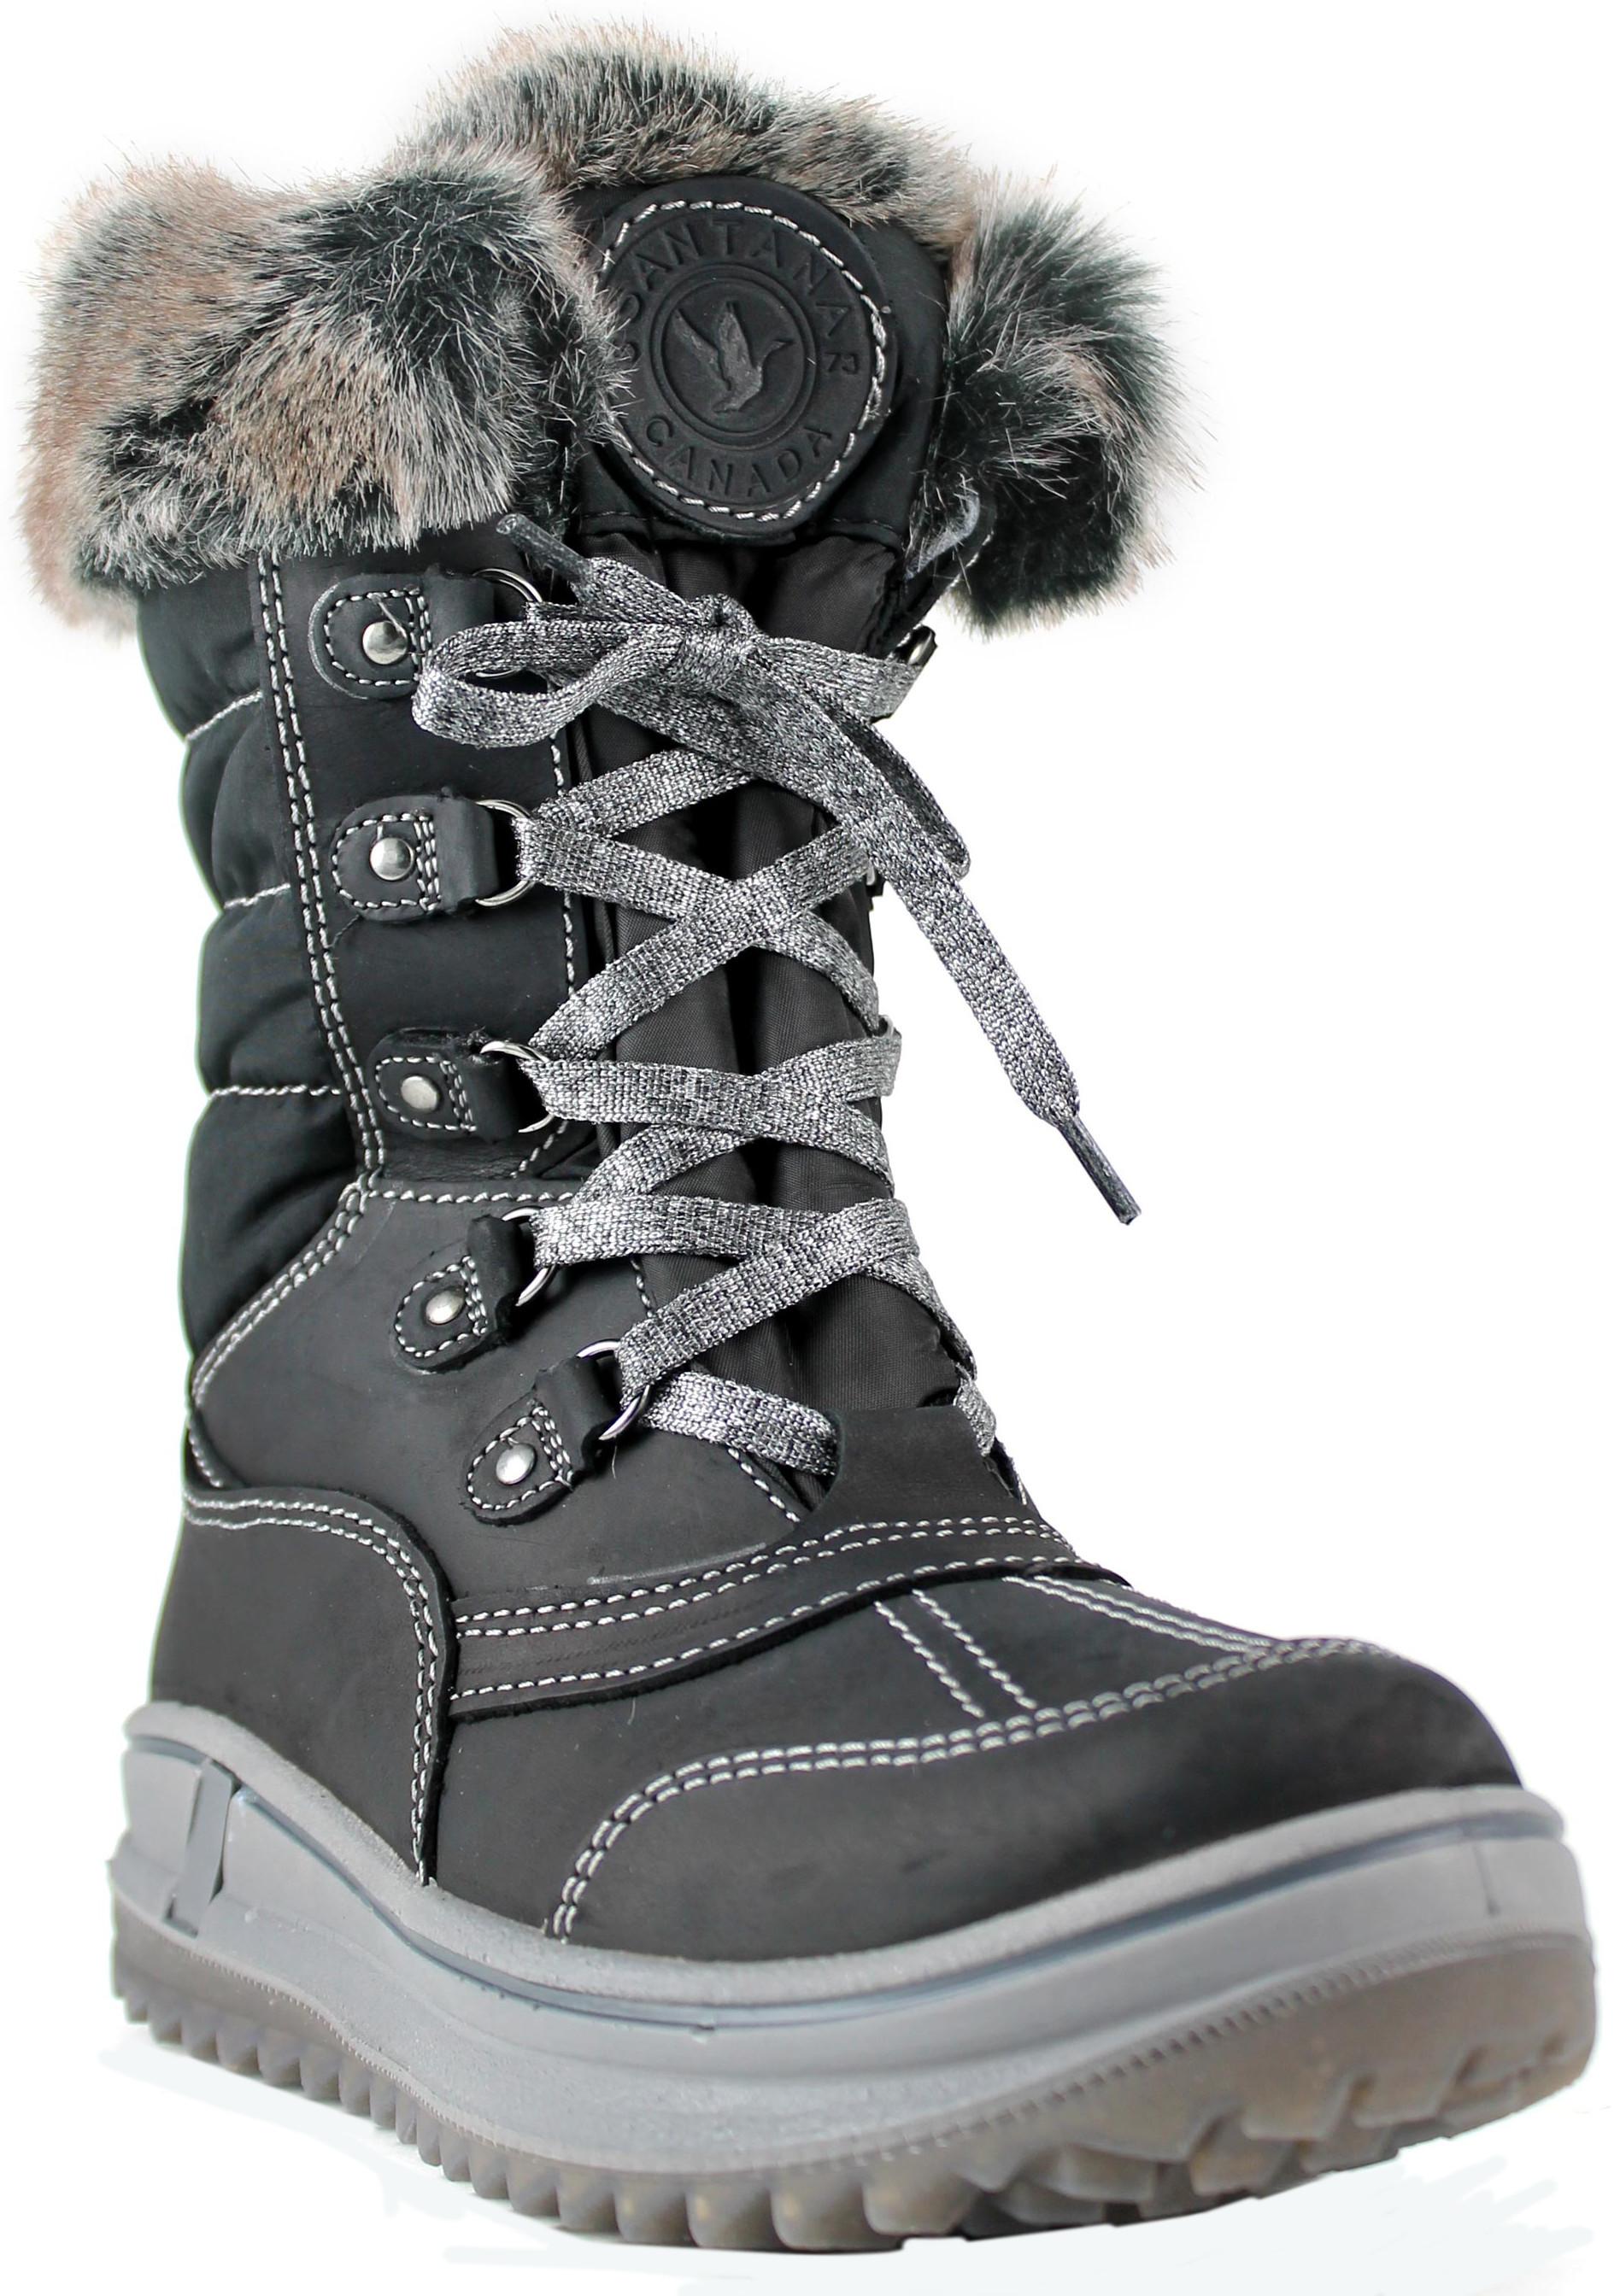 ac84b797468e6 Santana Canada Myrah Winter Boot - Women's, Up to 17% Off with Free S&H —  CampSaver